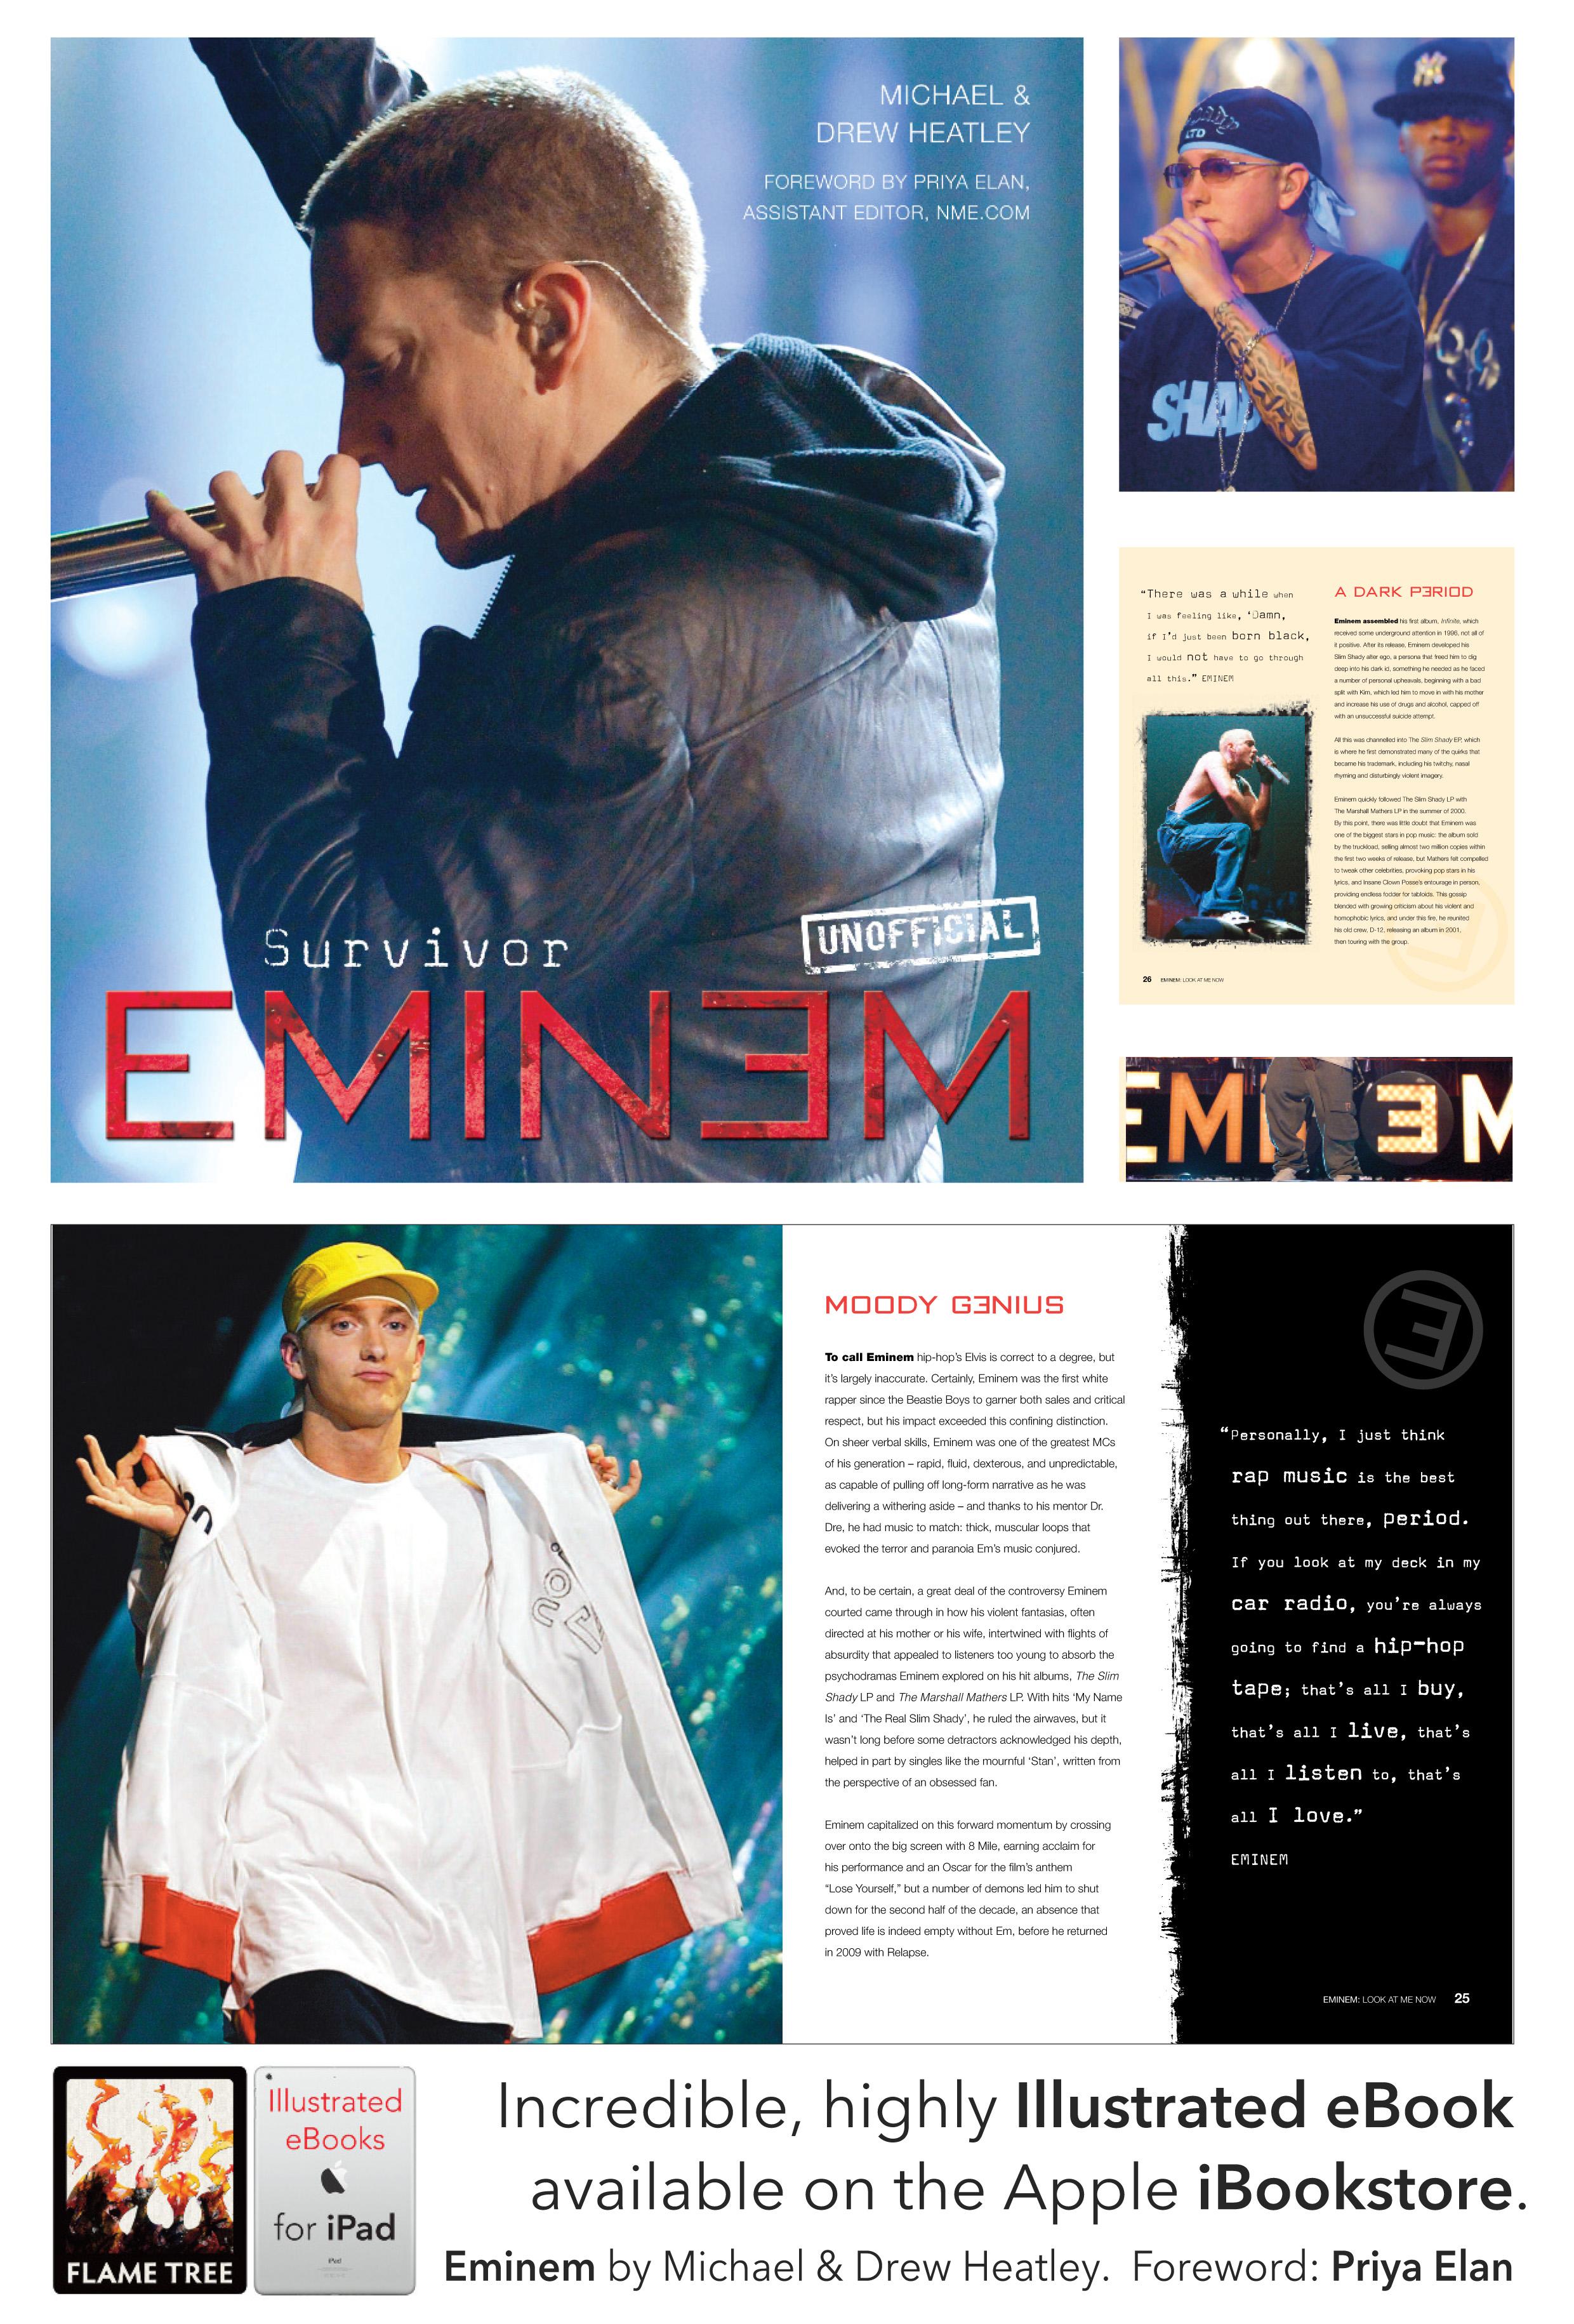 Eminem, illustrated ebook, ready for iPad